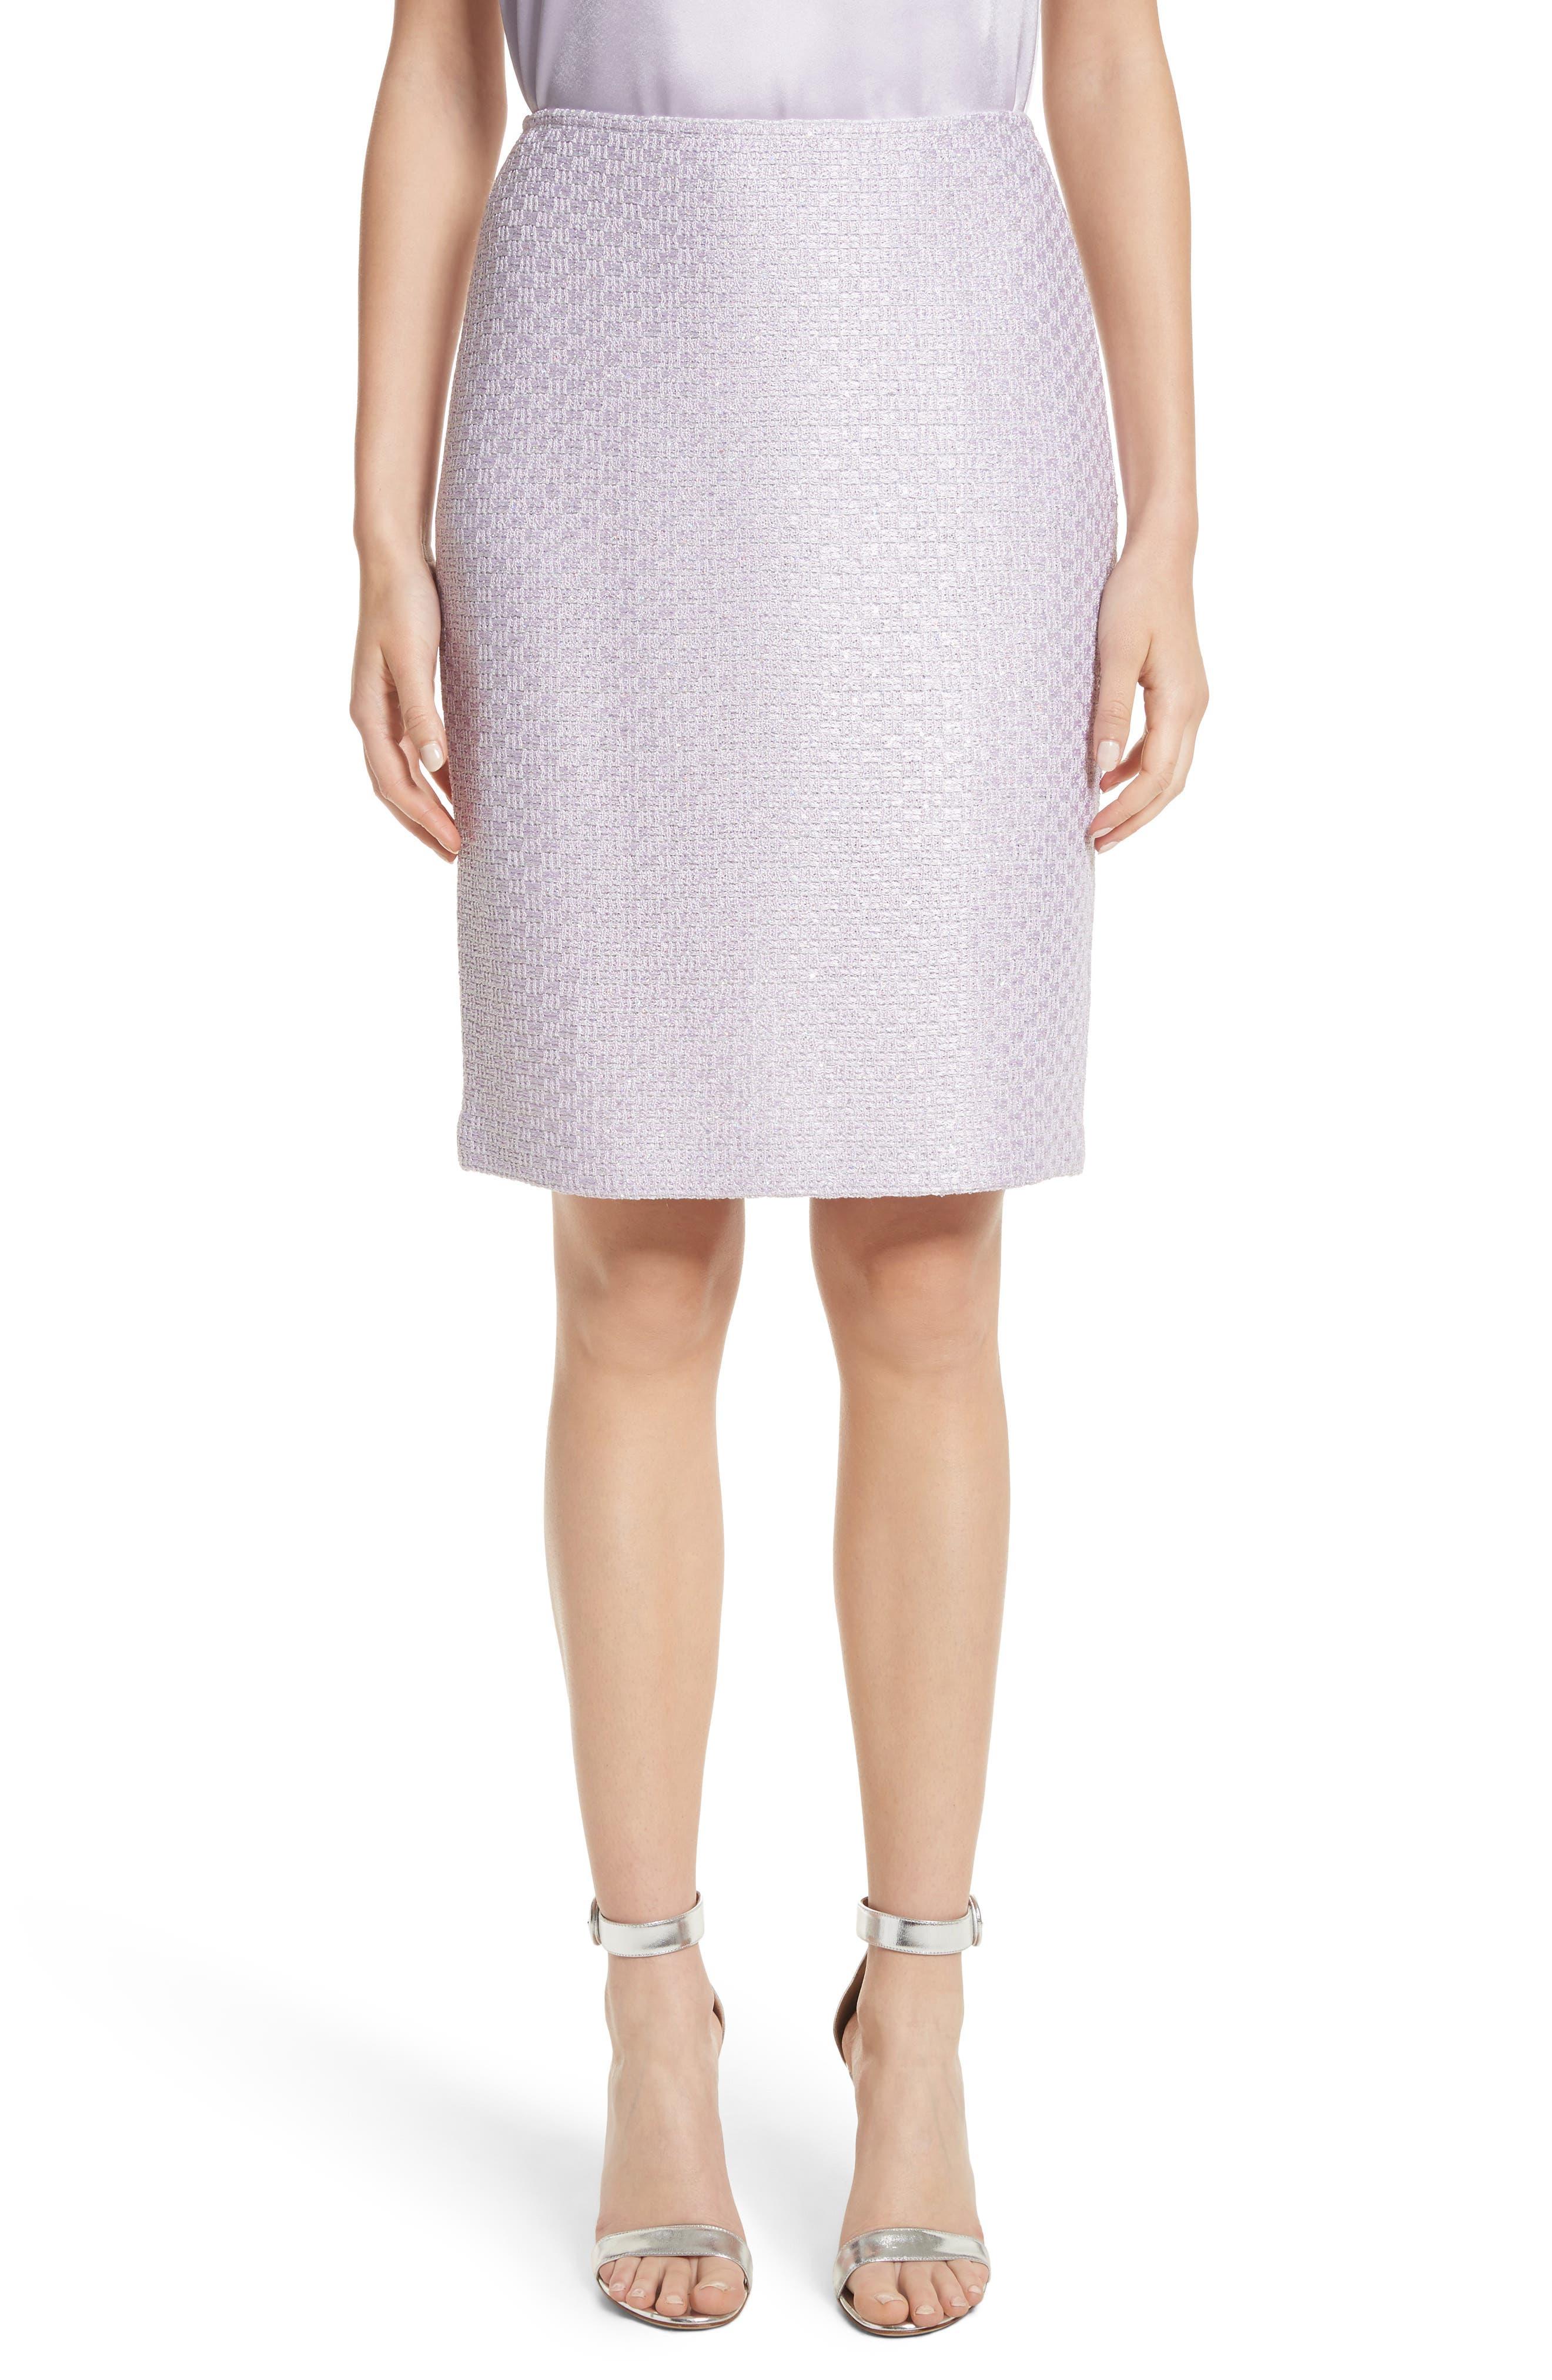 Hansh Sequin Knit Pencil Skirt,                             Main thumbnail 1, color,                             Lilac Multi